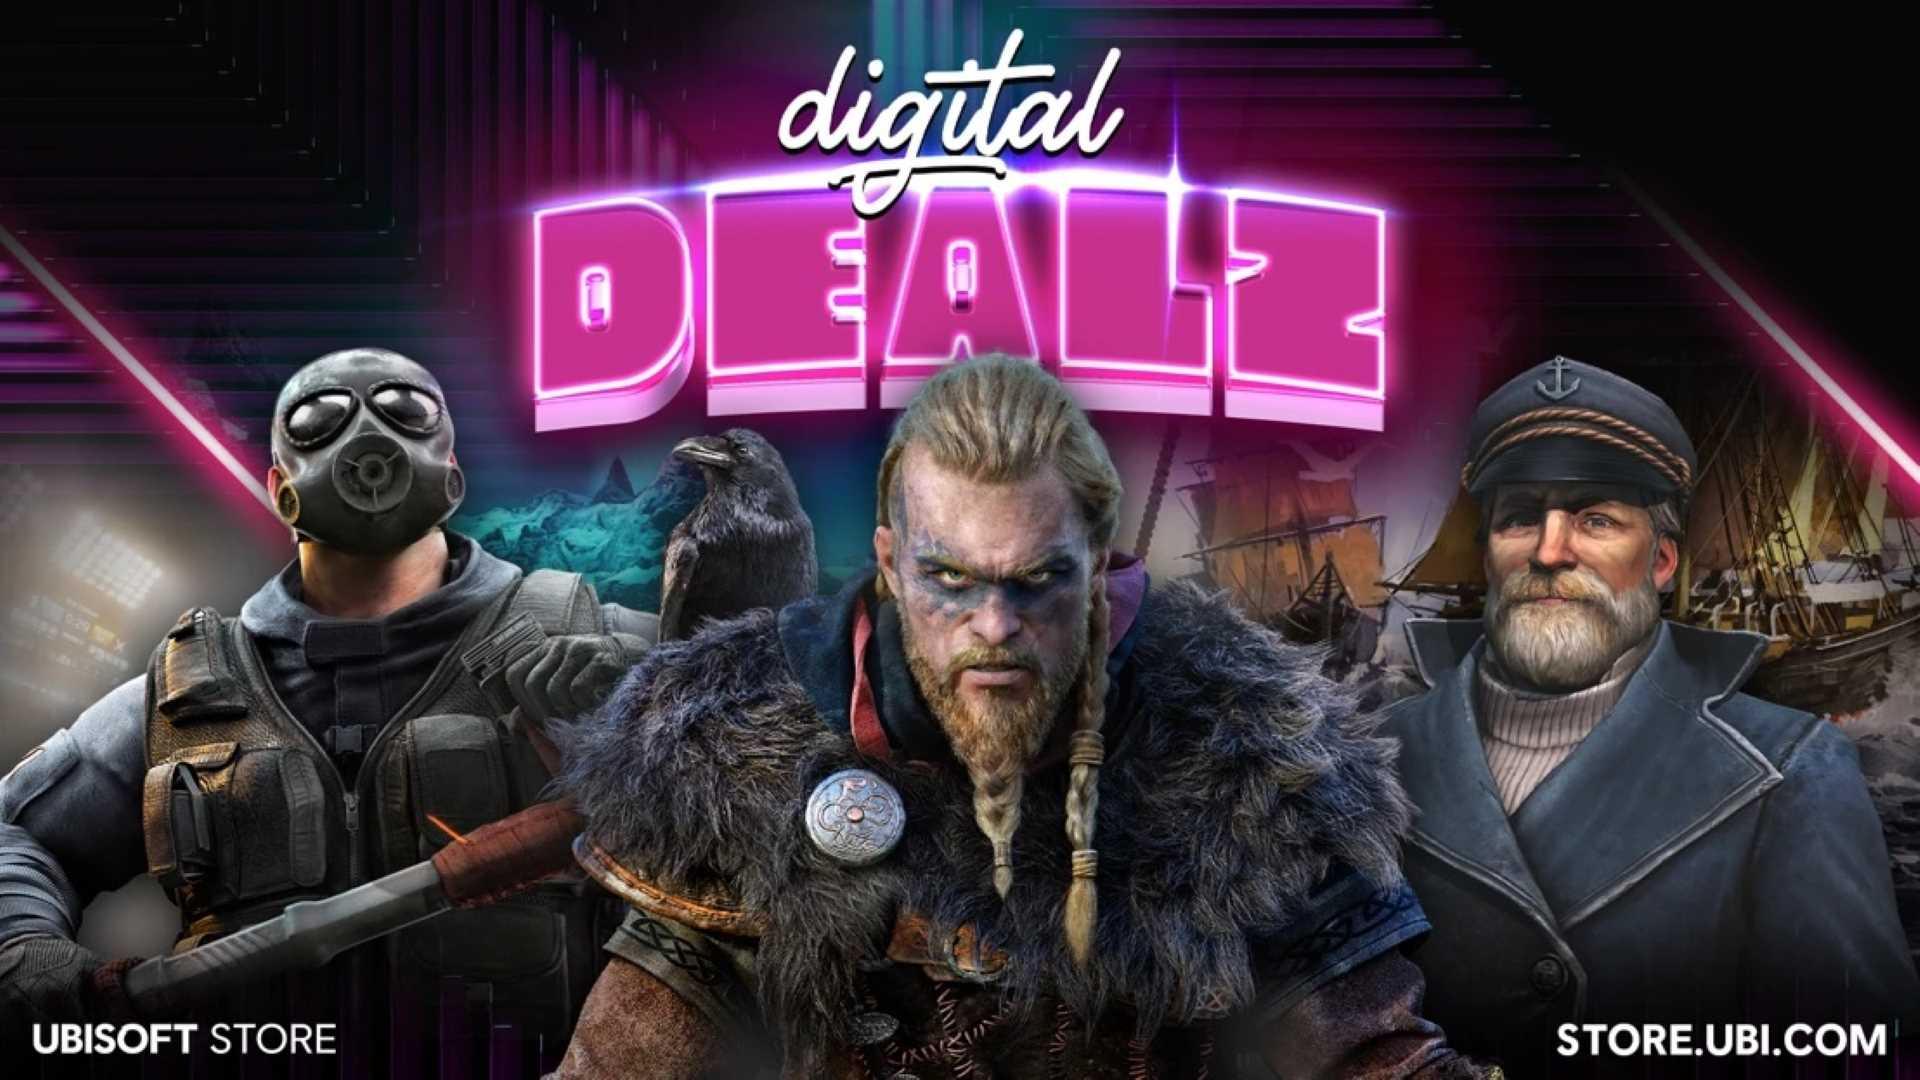 Digital Dealz Ubisoft - Key Art